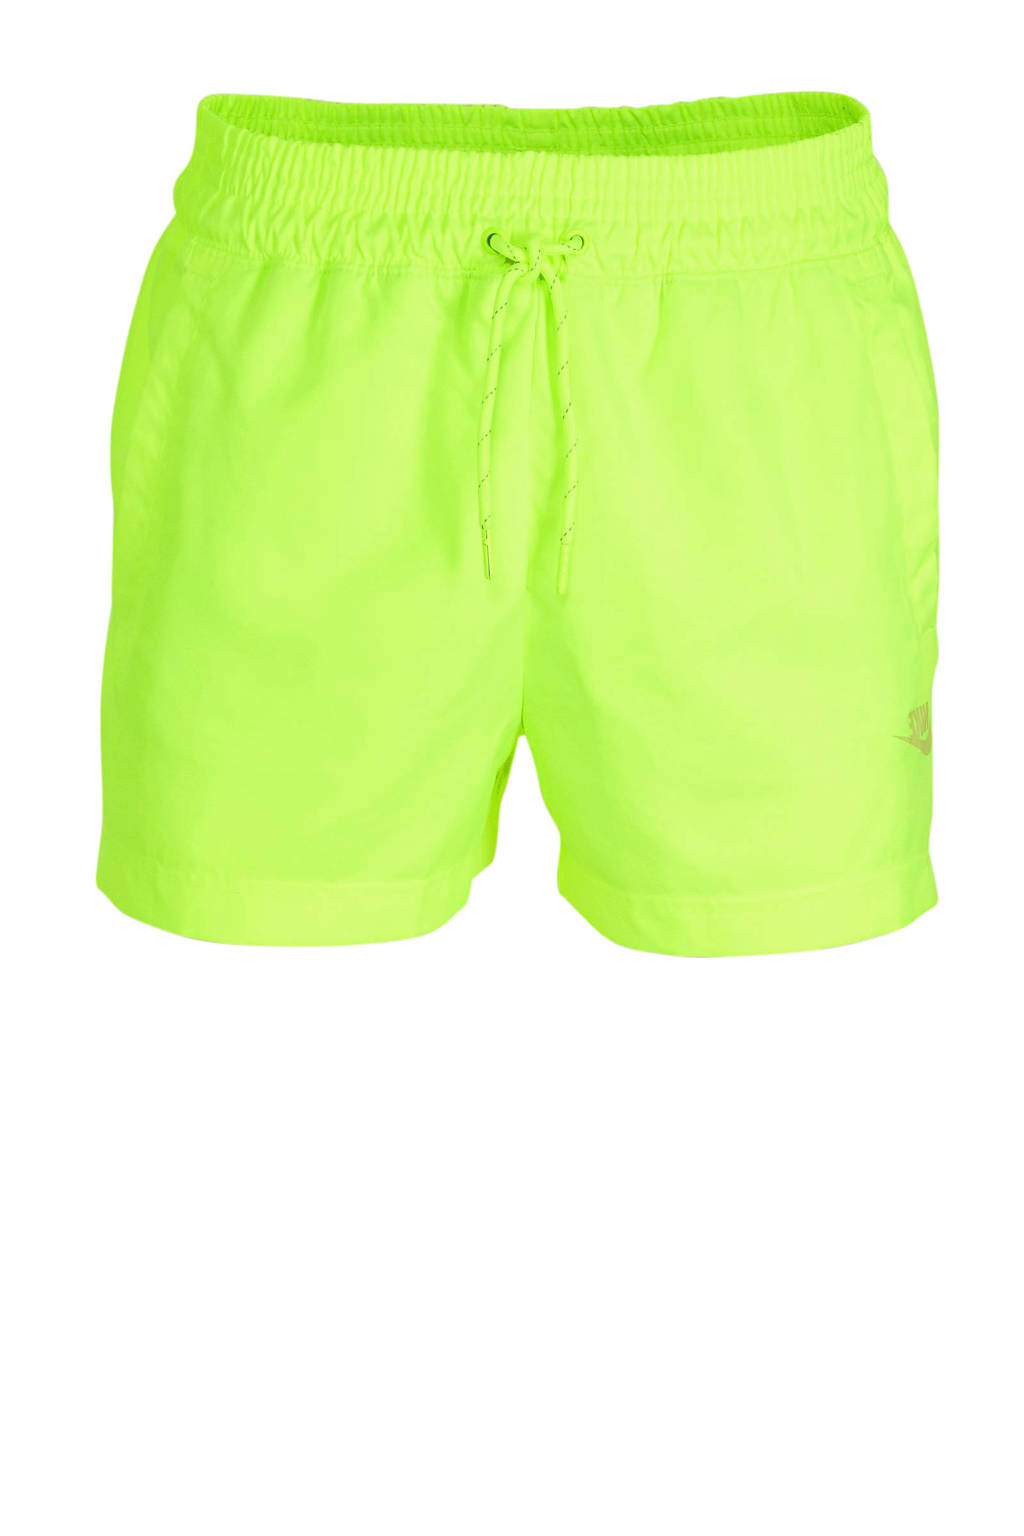 Nike short limegroen, Limegroen